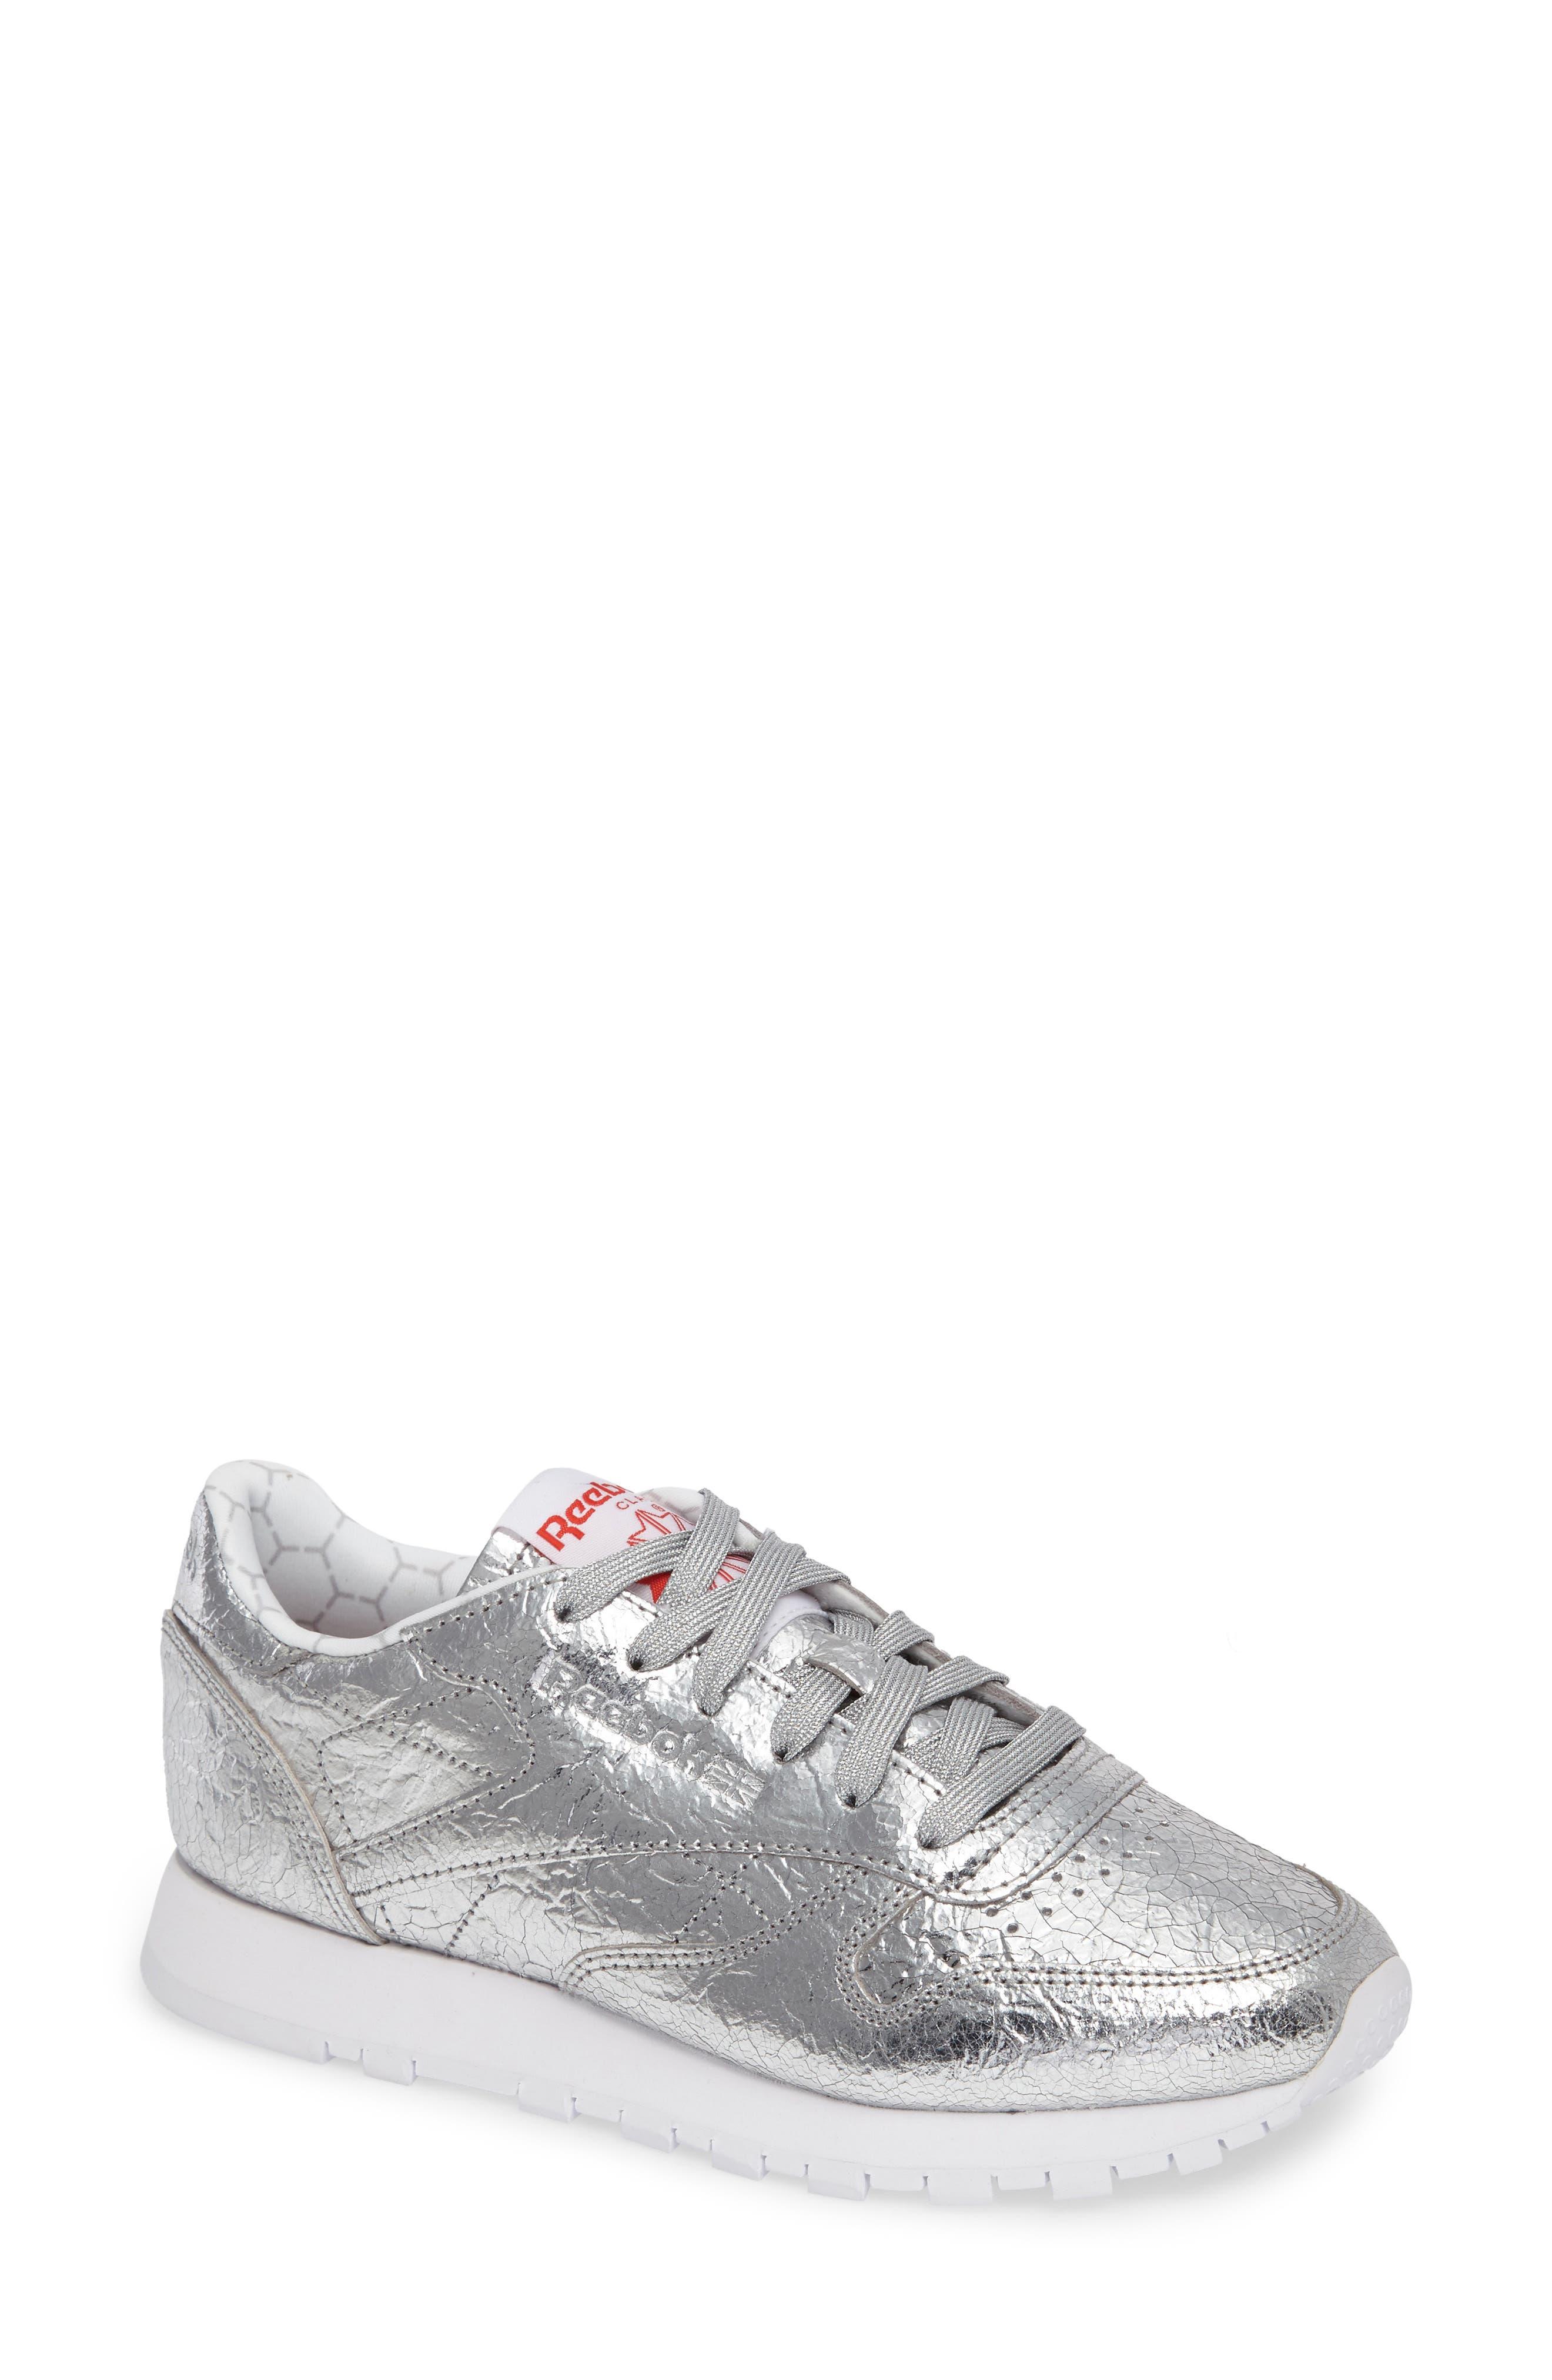 Alternate Image 1 Selected - Reebok Classic Leather HD Foil Sneaker (Women)